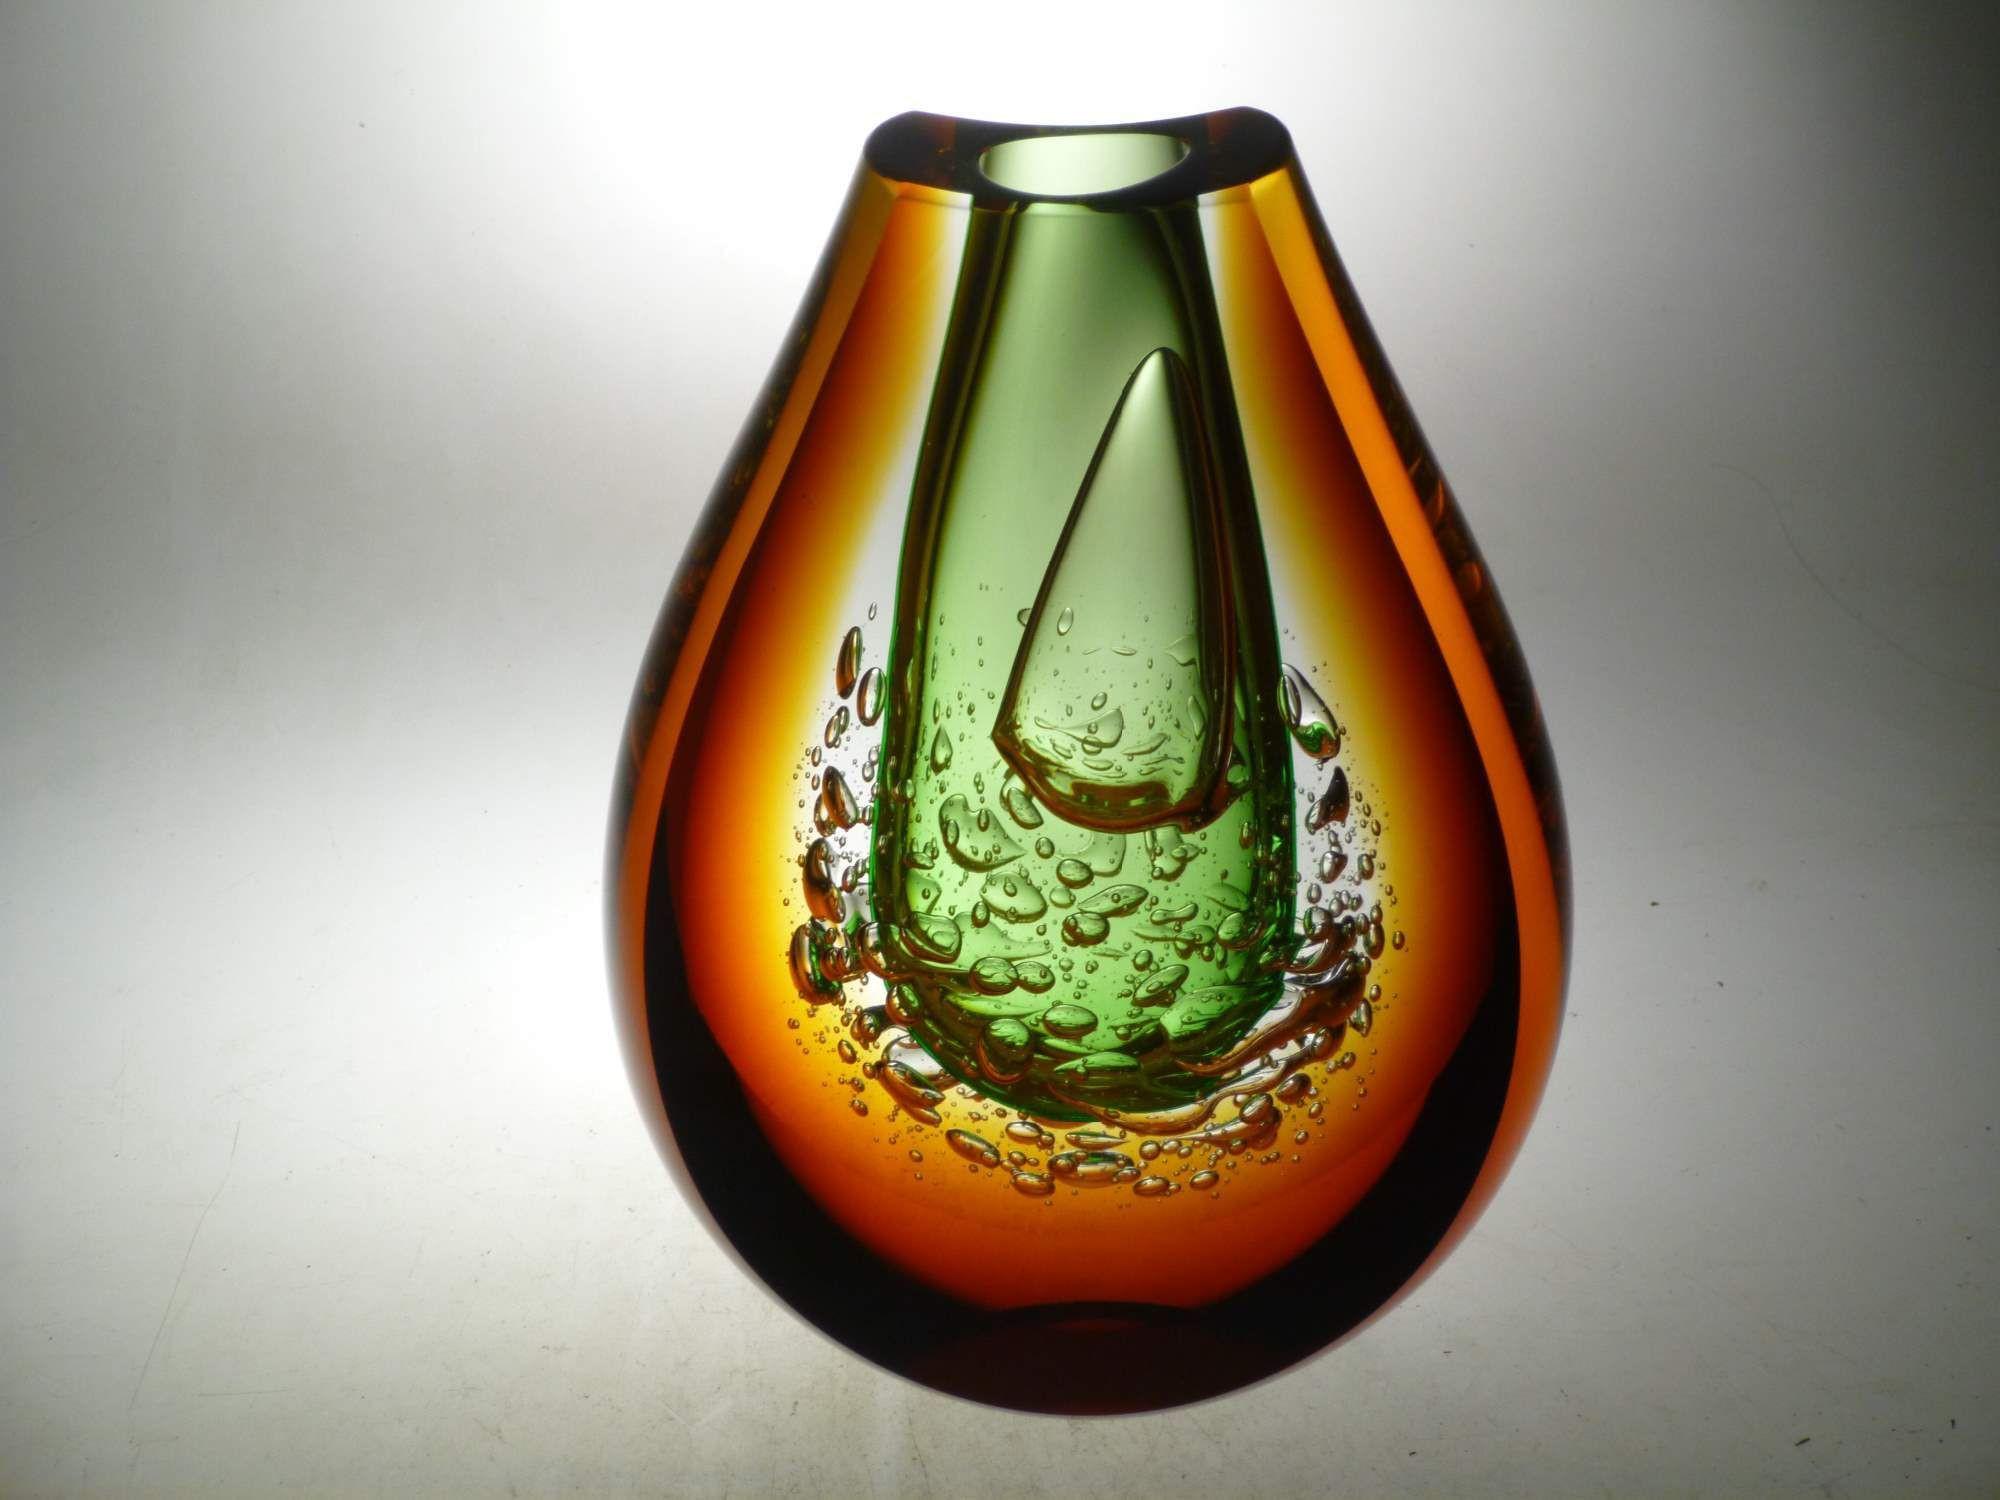 11 Perfect Kosta Boda Vase orange 2021 free download kosta boda vase orange of amaliesklo sklo rajce net stained glass pinterest glass in amaliesklo sklo rajce net